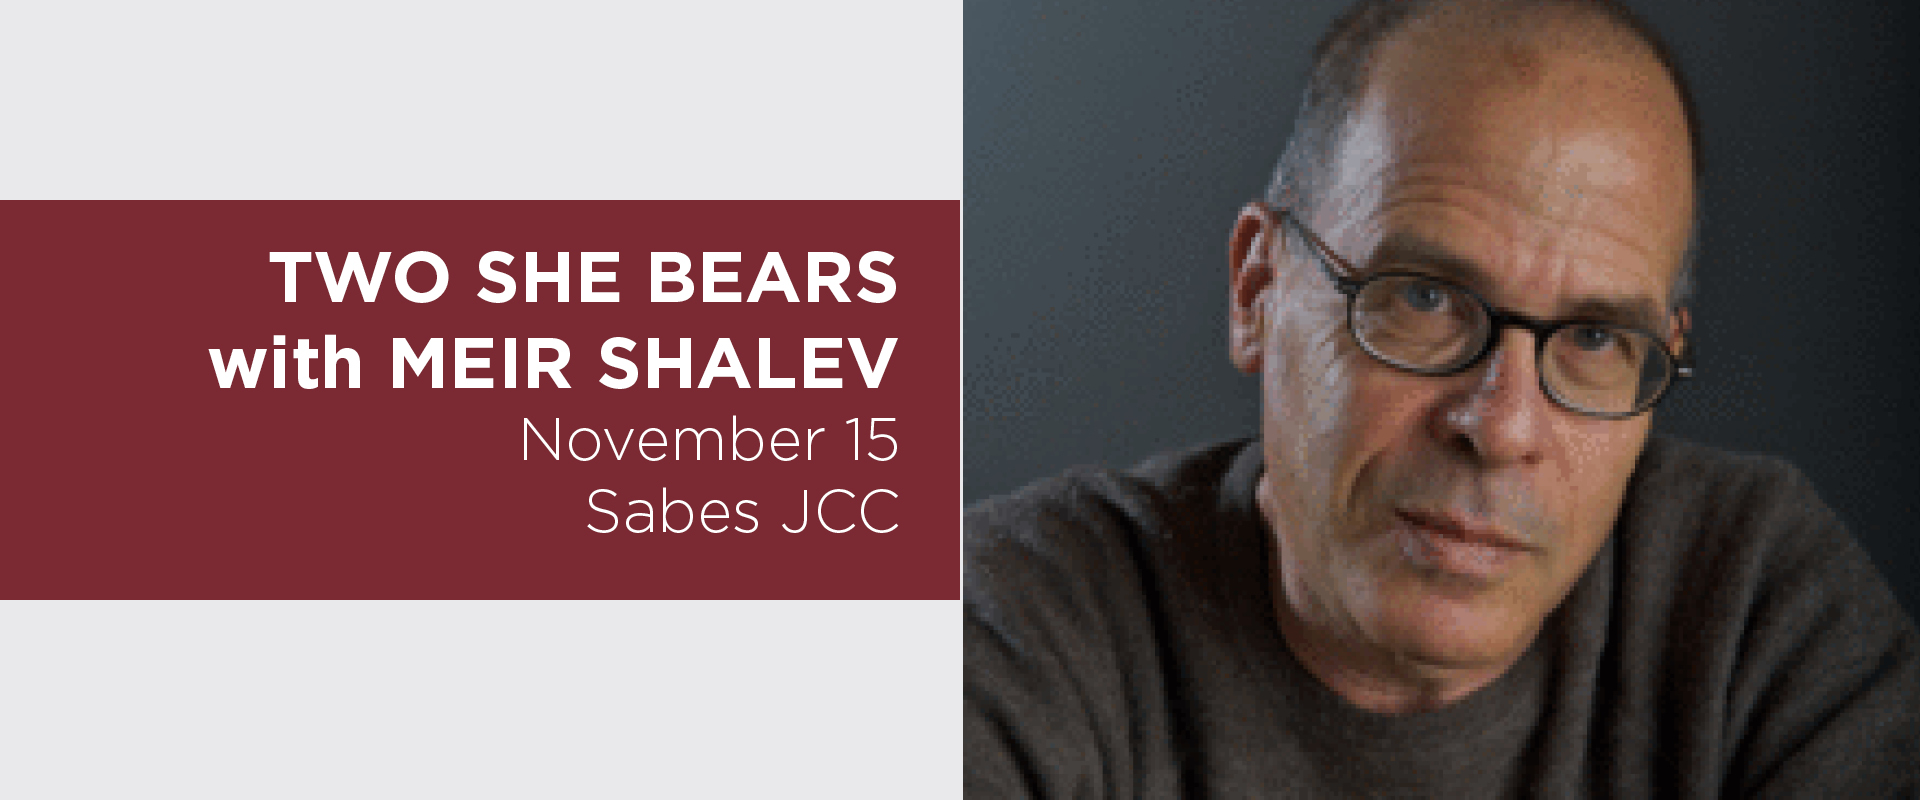 two-she-bears